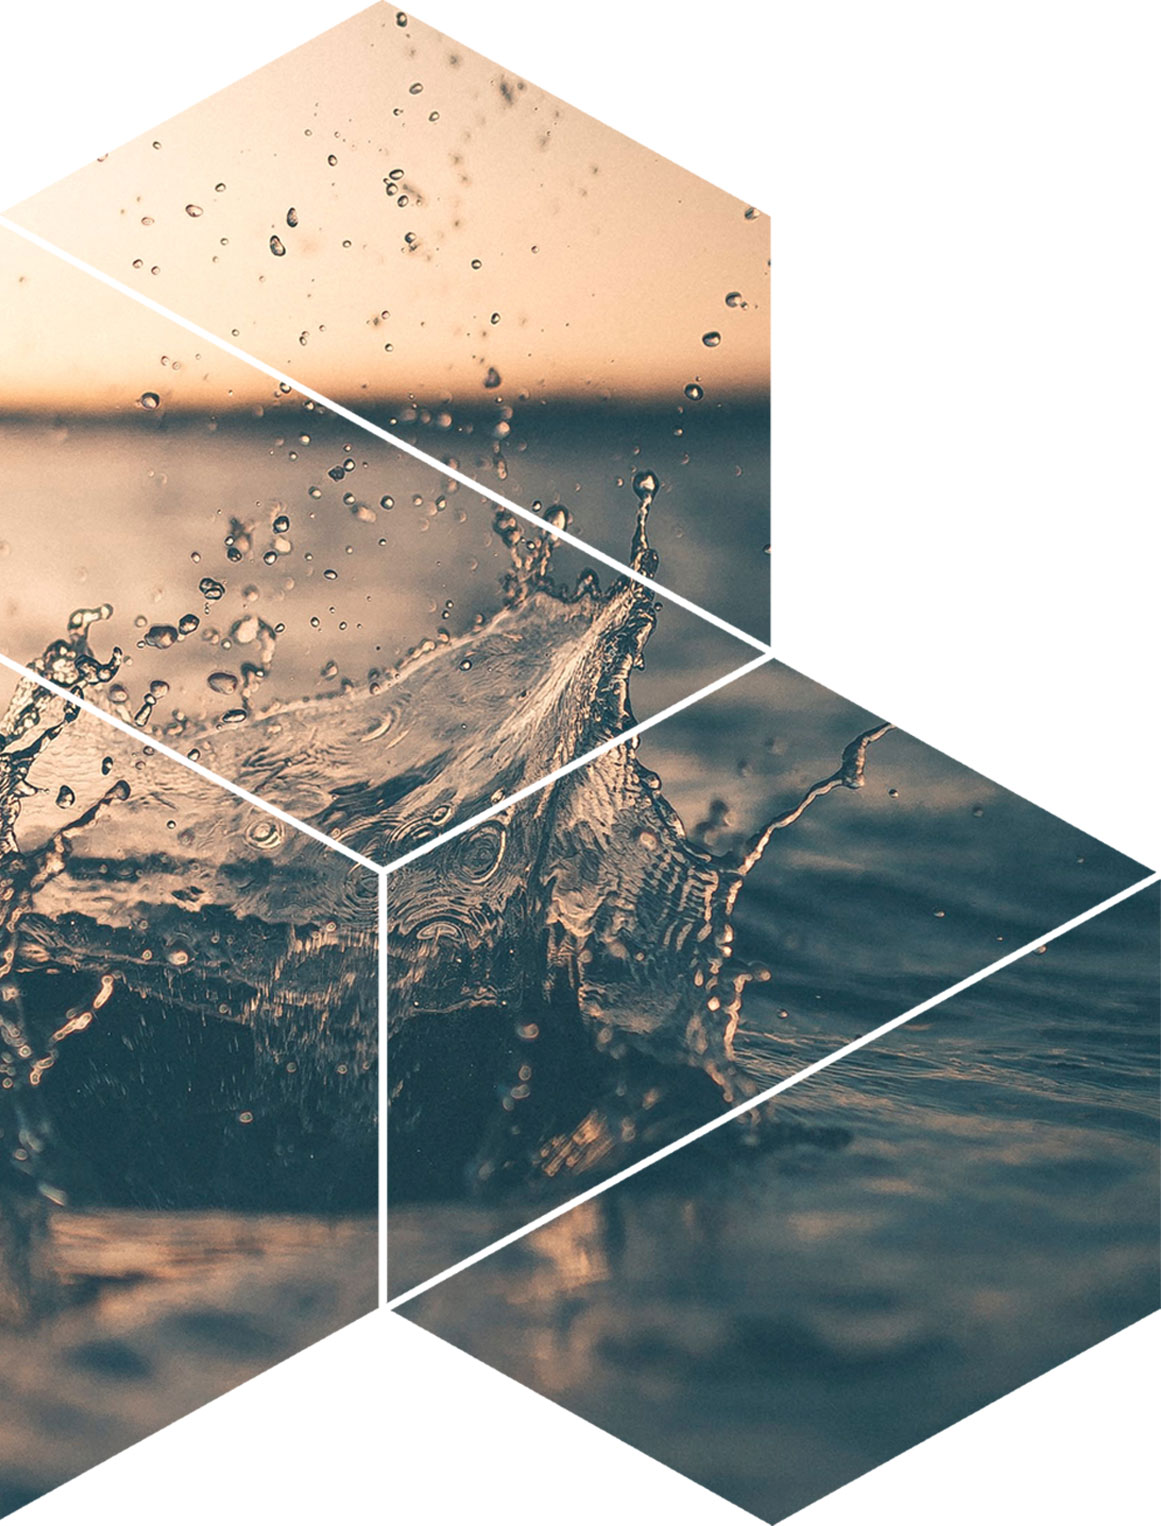 Splash1.jpg